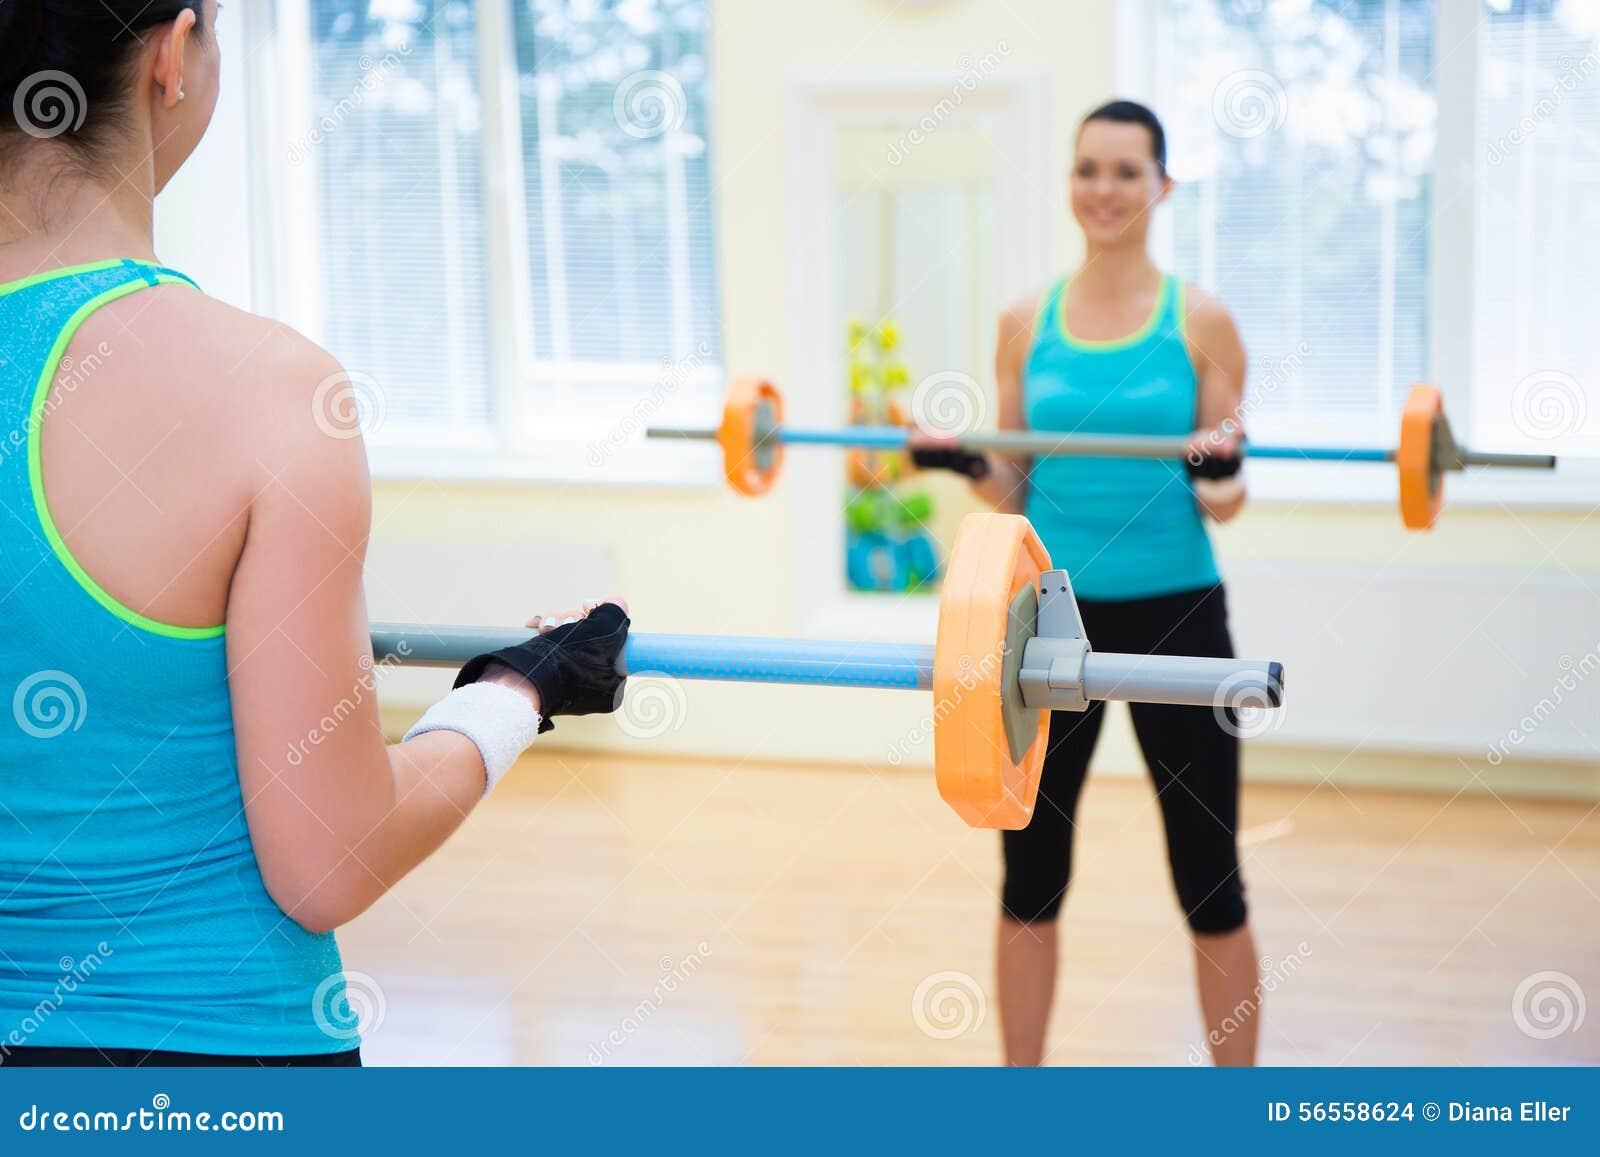 Download Έννοια αθλητικής ανύψωσης - νέα γυναίκα που ασκεί με το Barbell Στοκ Εικόνες - εικόνα από rear, άσκηση: 56558624